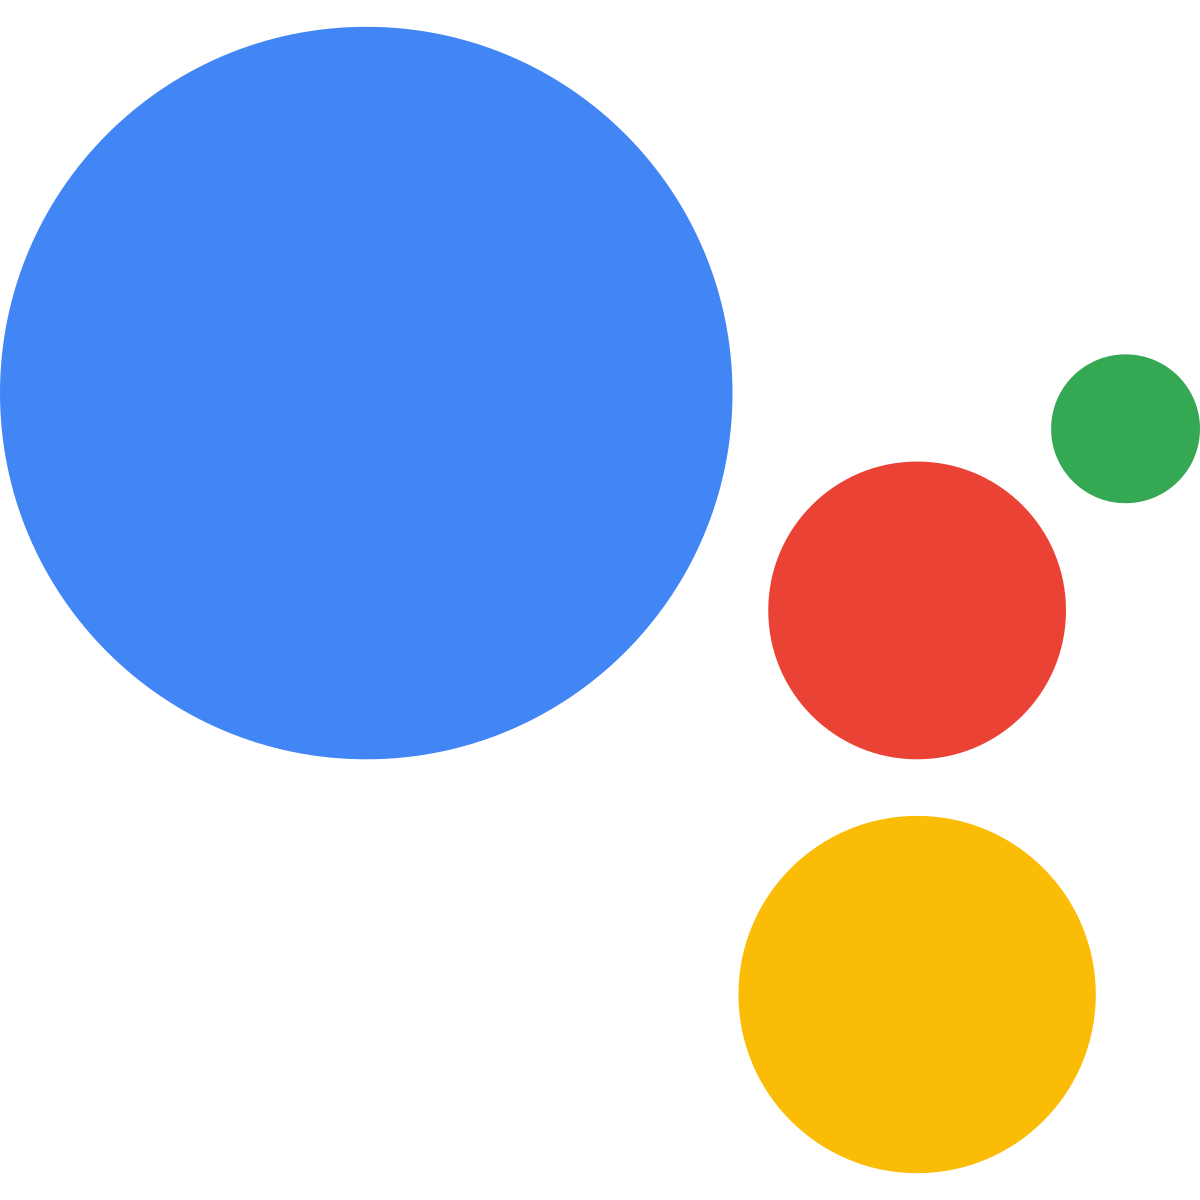 Un Asistente de Google más útil e indispensable